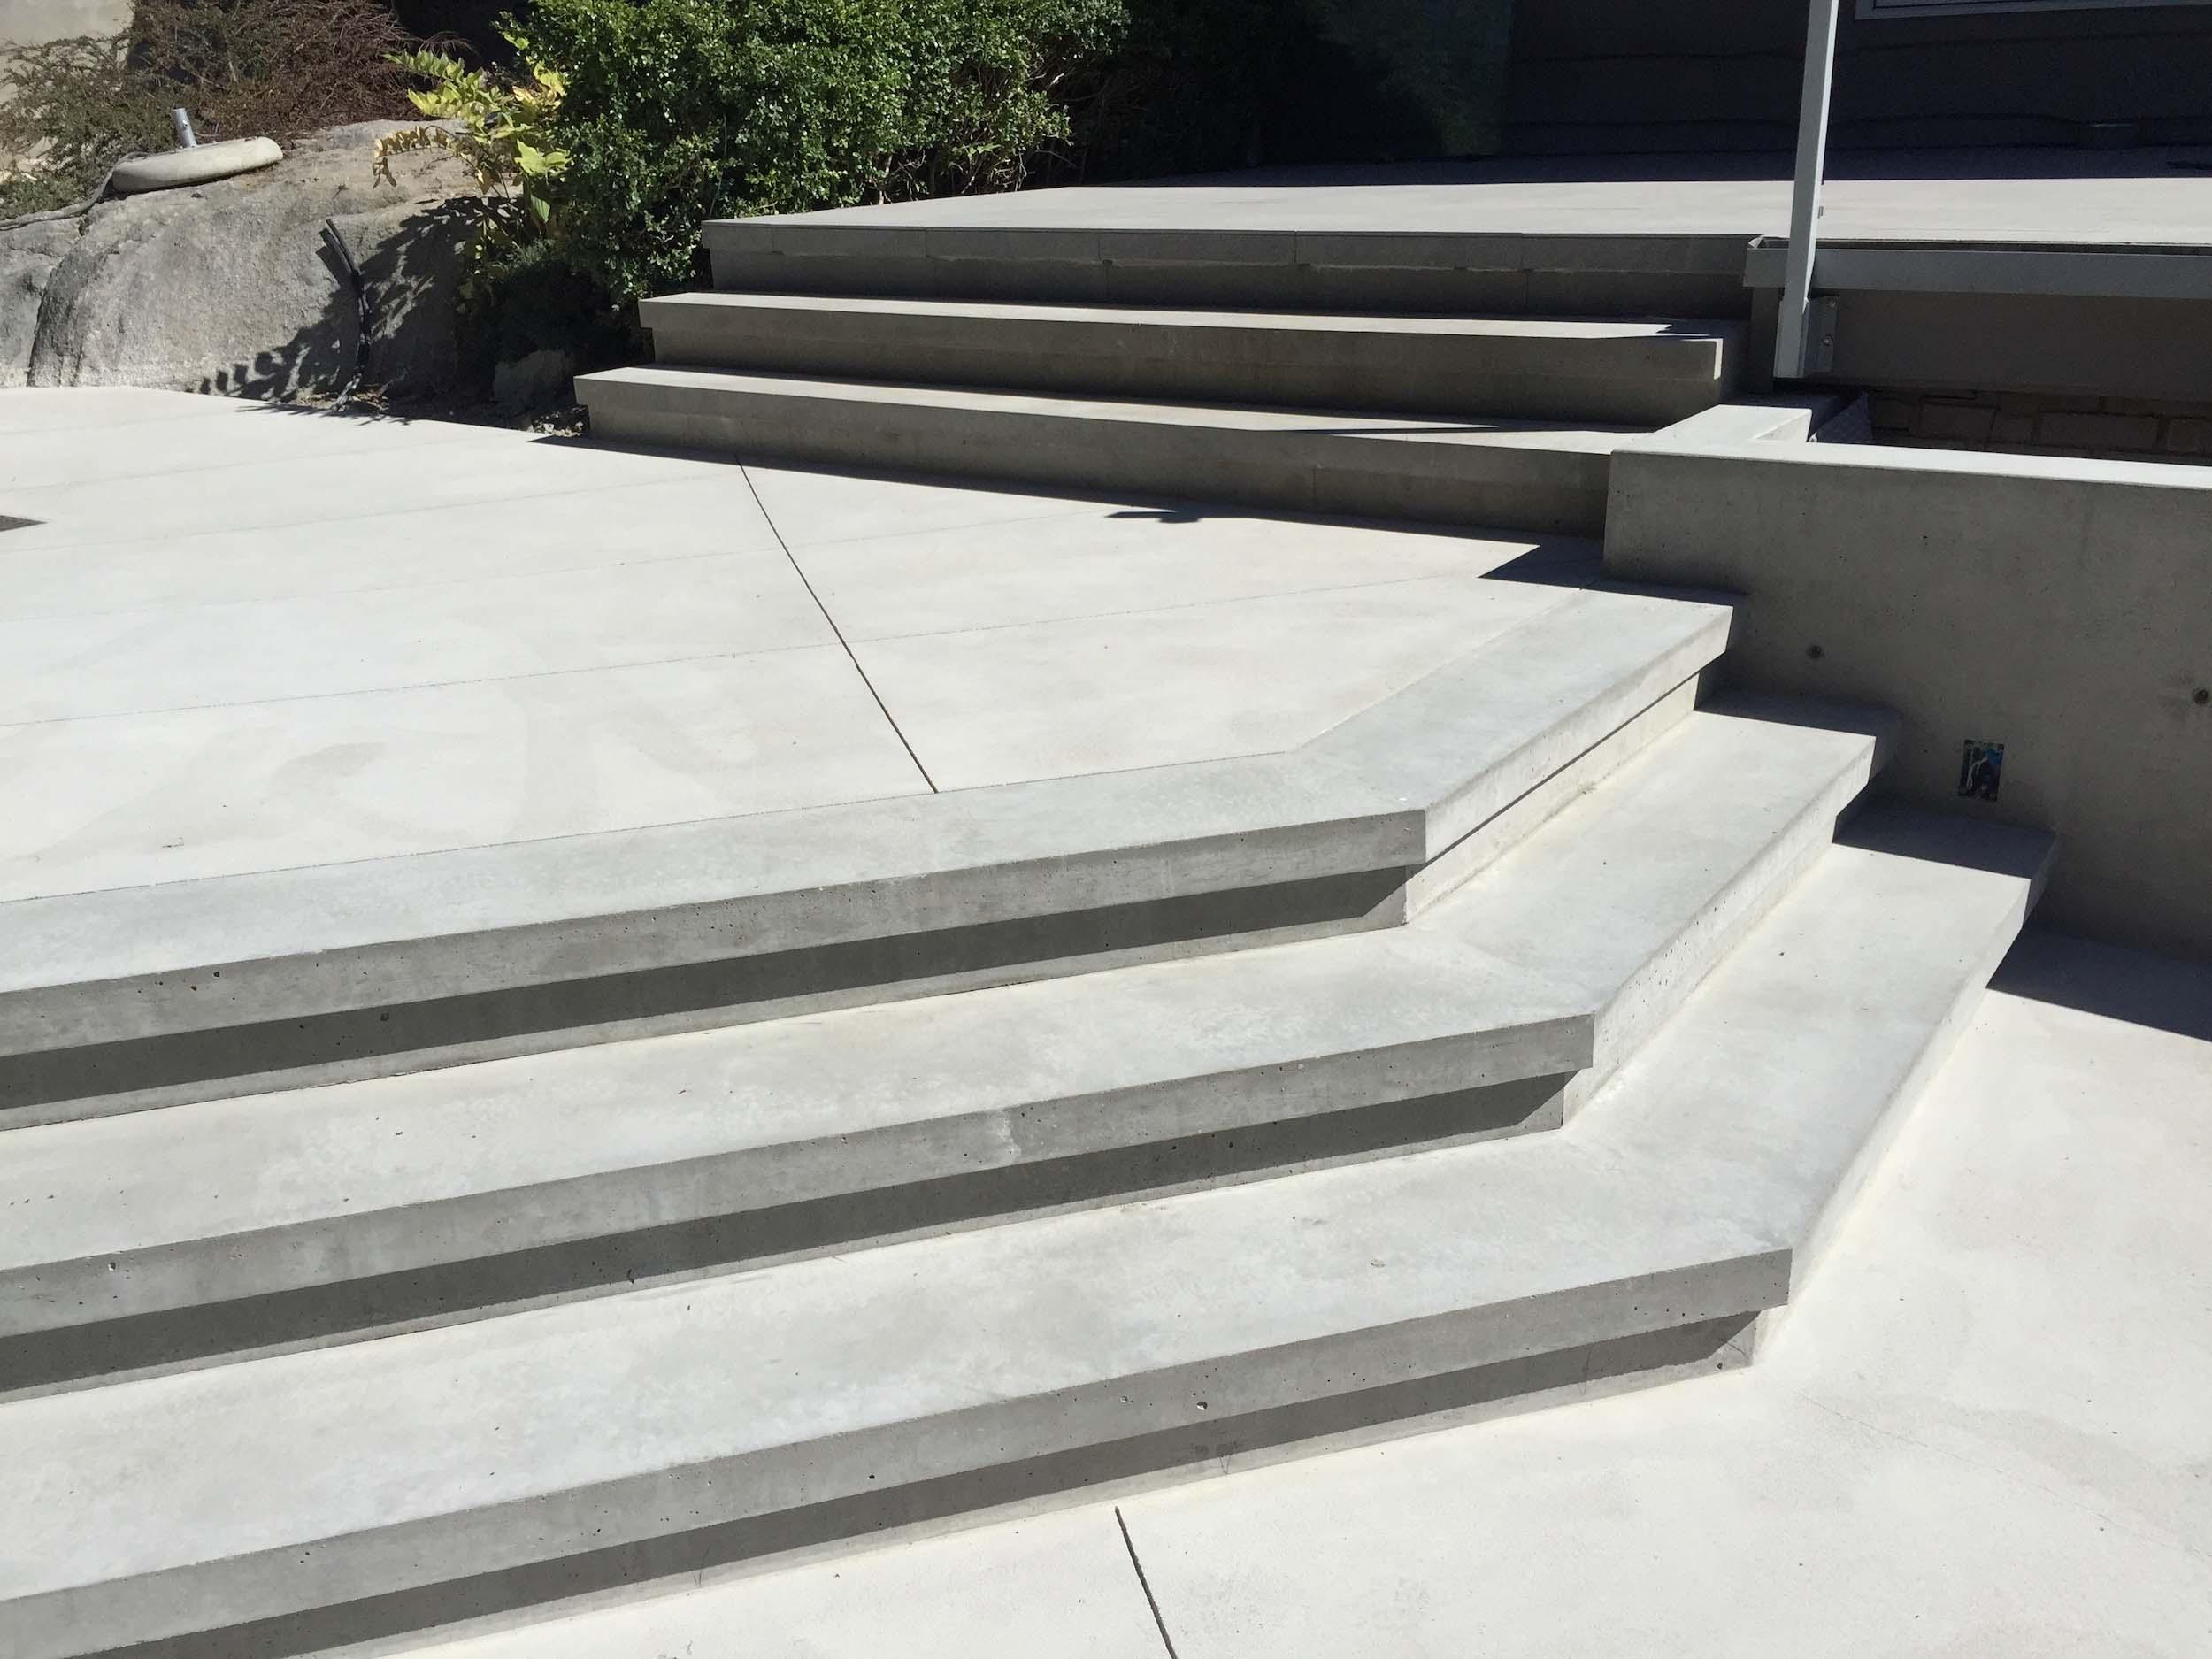 Postle_Construction_ConcreteForming26.jpg